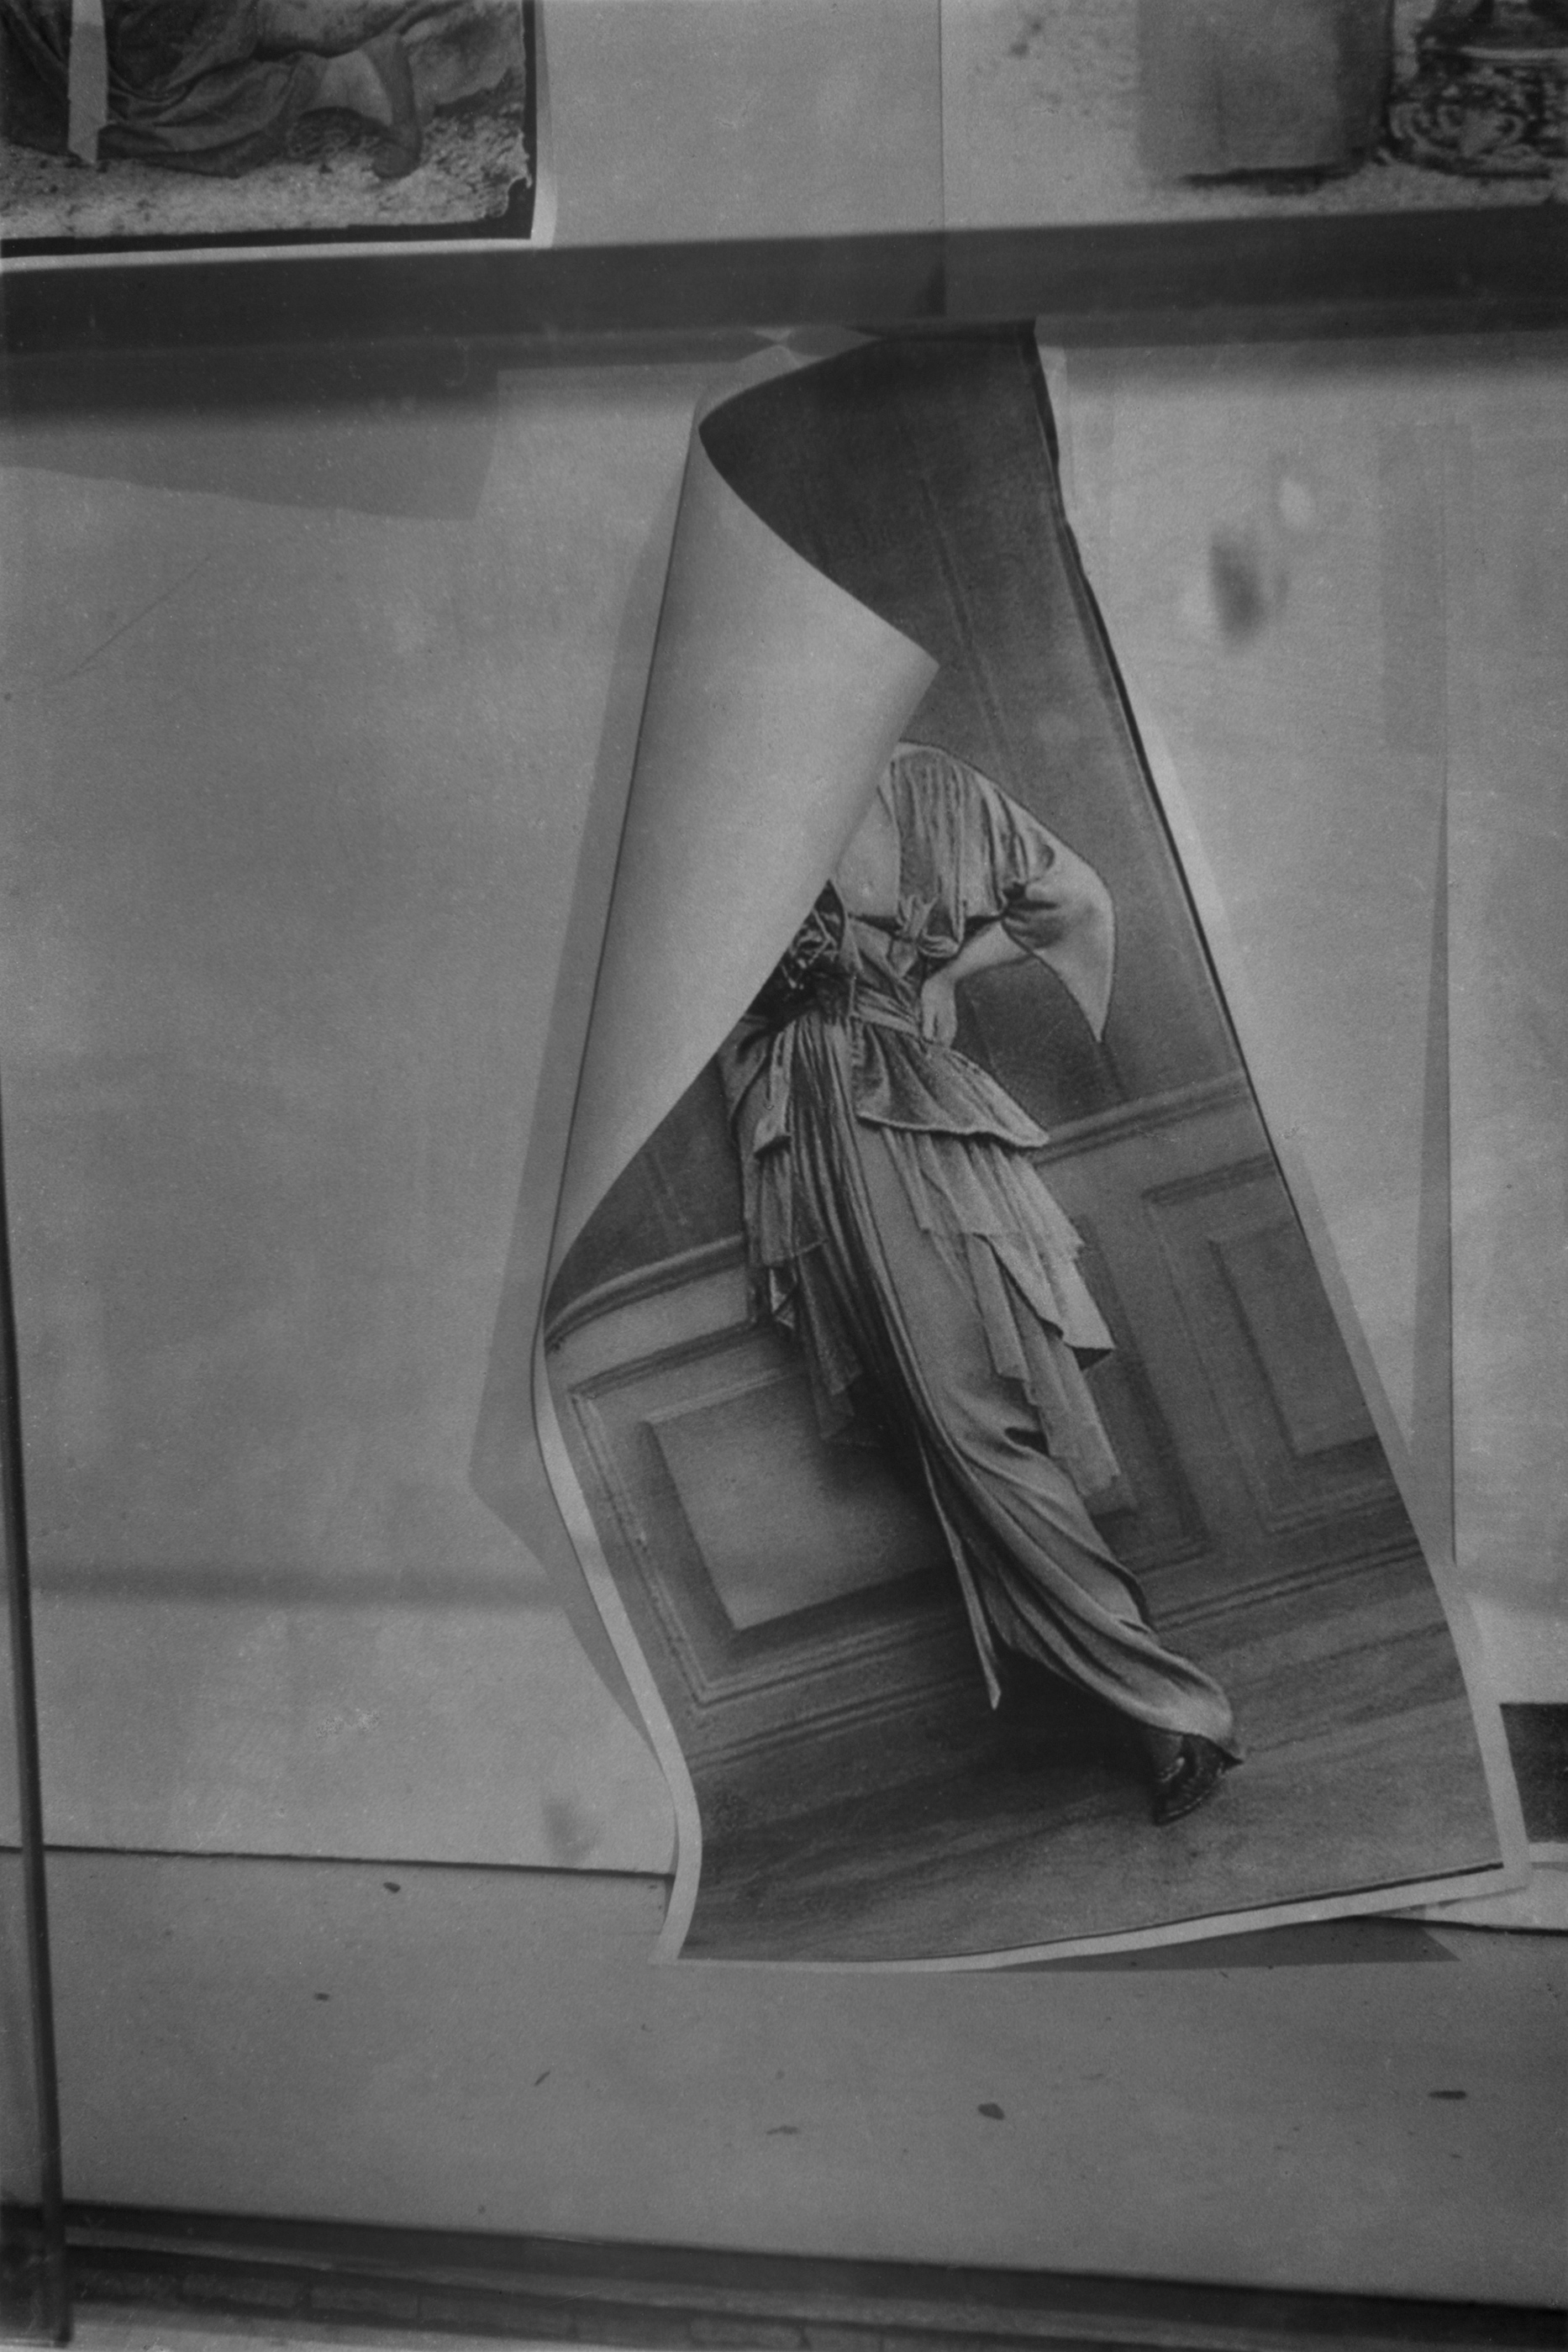 L.V.-V.L.-(3)-2016 , 2016 180 x 120 cm, gelatin silver print © Dirk Braeckman / Courtesy of Zeno X Gallery, Antwerp